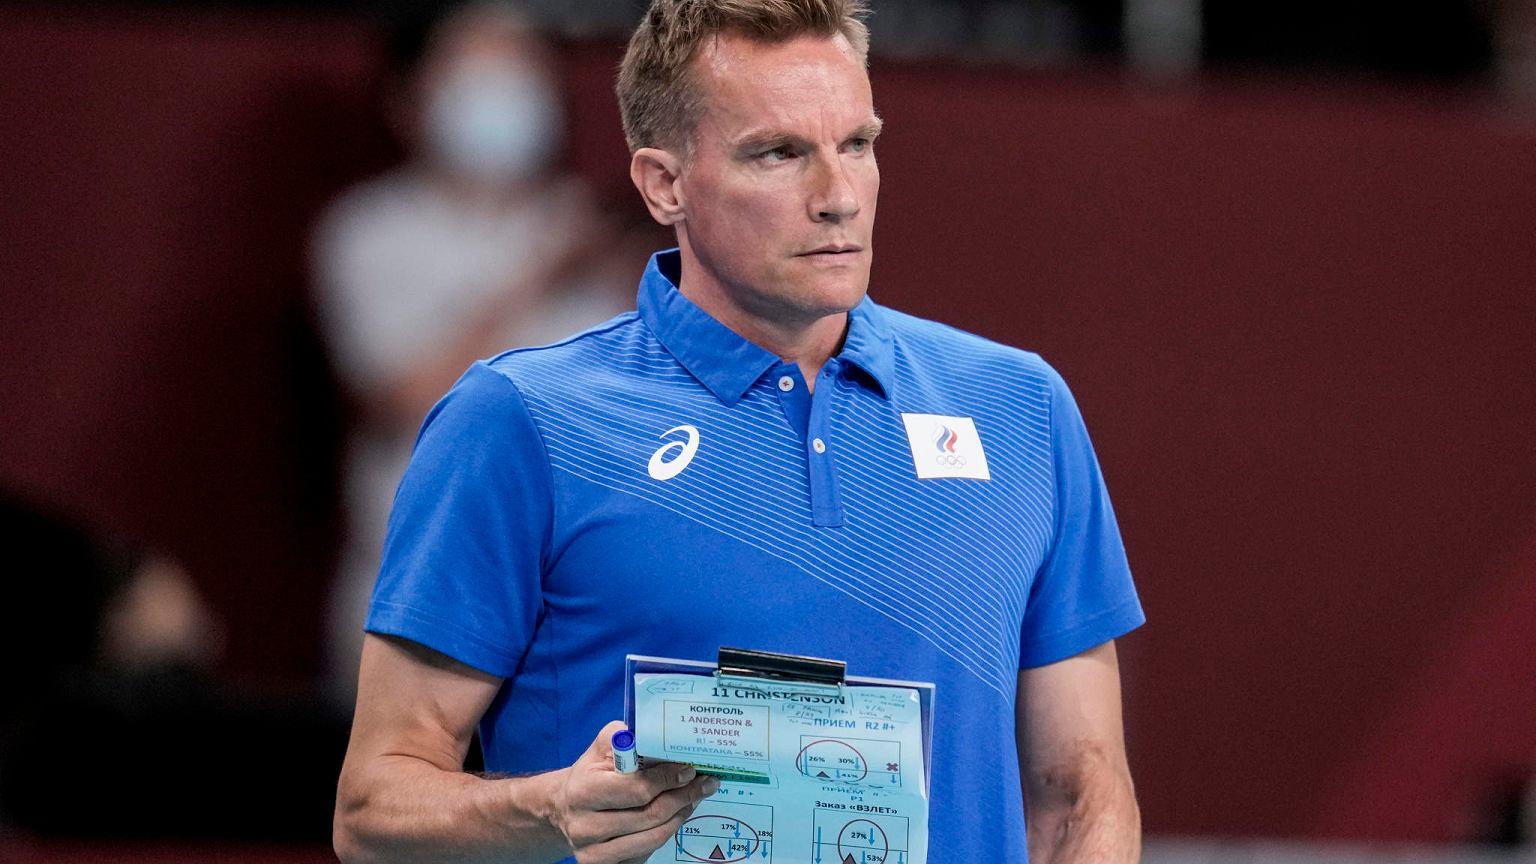 Trener Rosjan krytykuje zesp